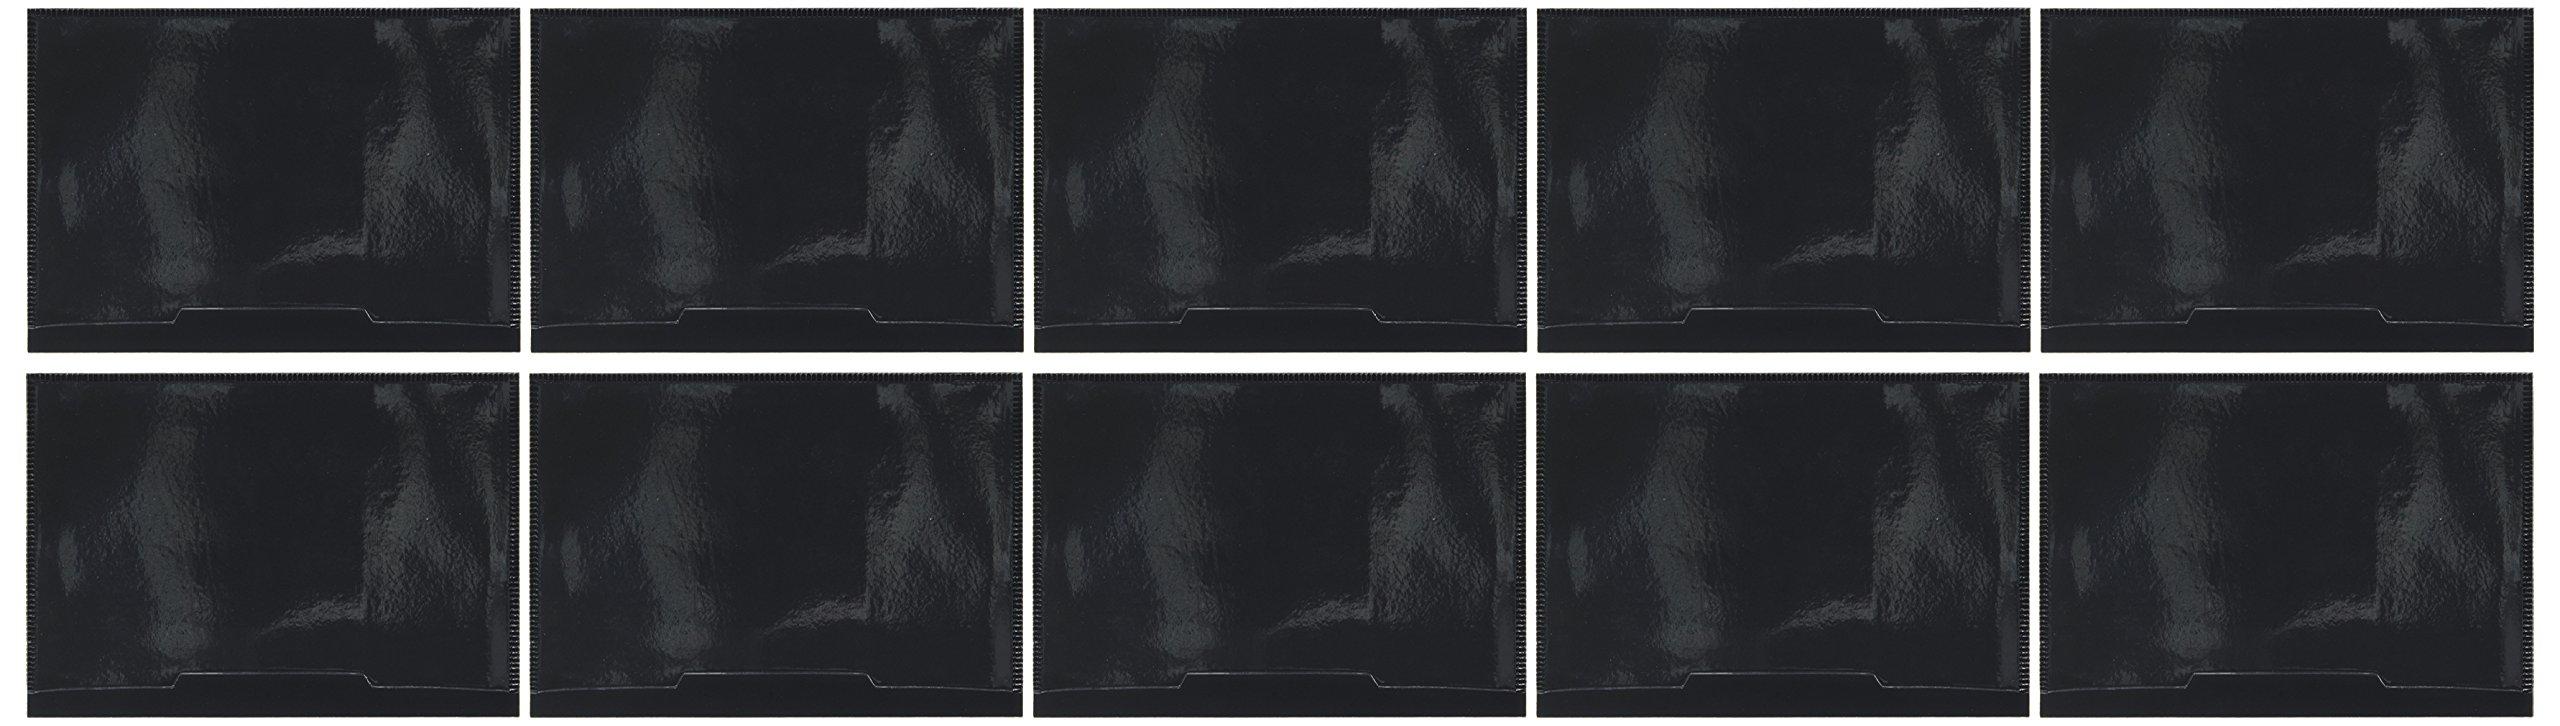 Tatco Magnetic Vinyl Label Holder, 4.4'' x 6.4'', Black, 10 Pack (TCO29400)